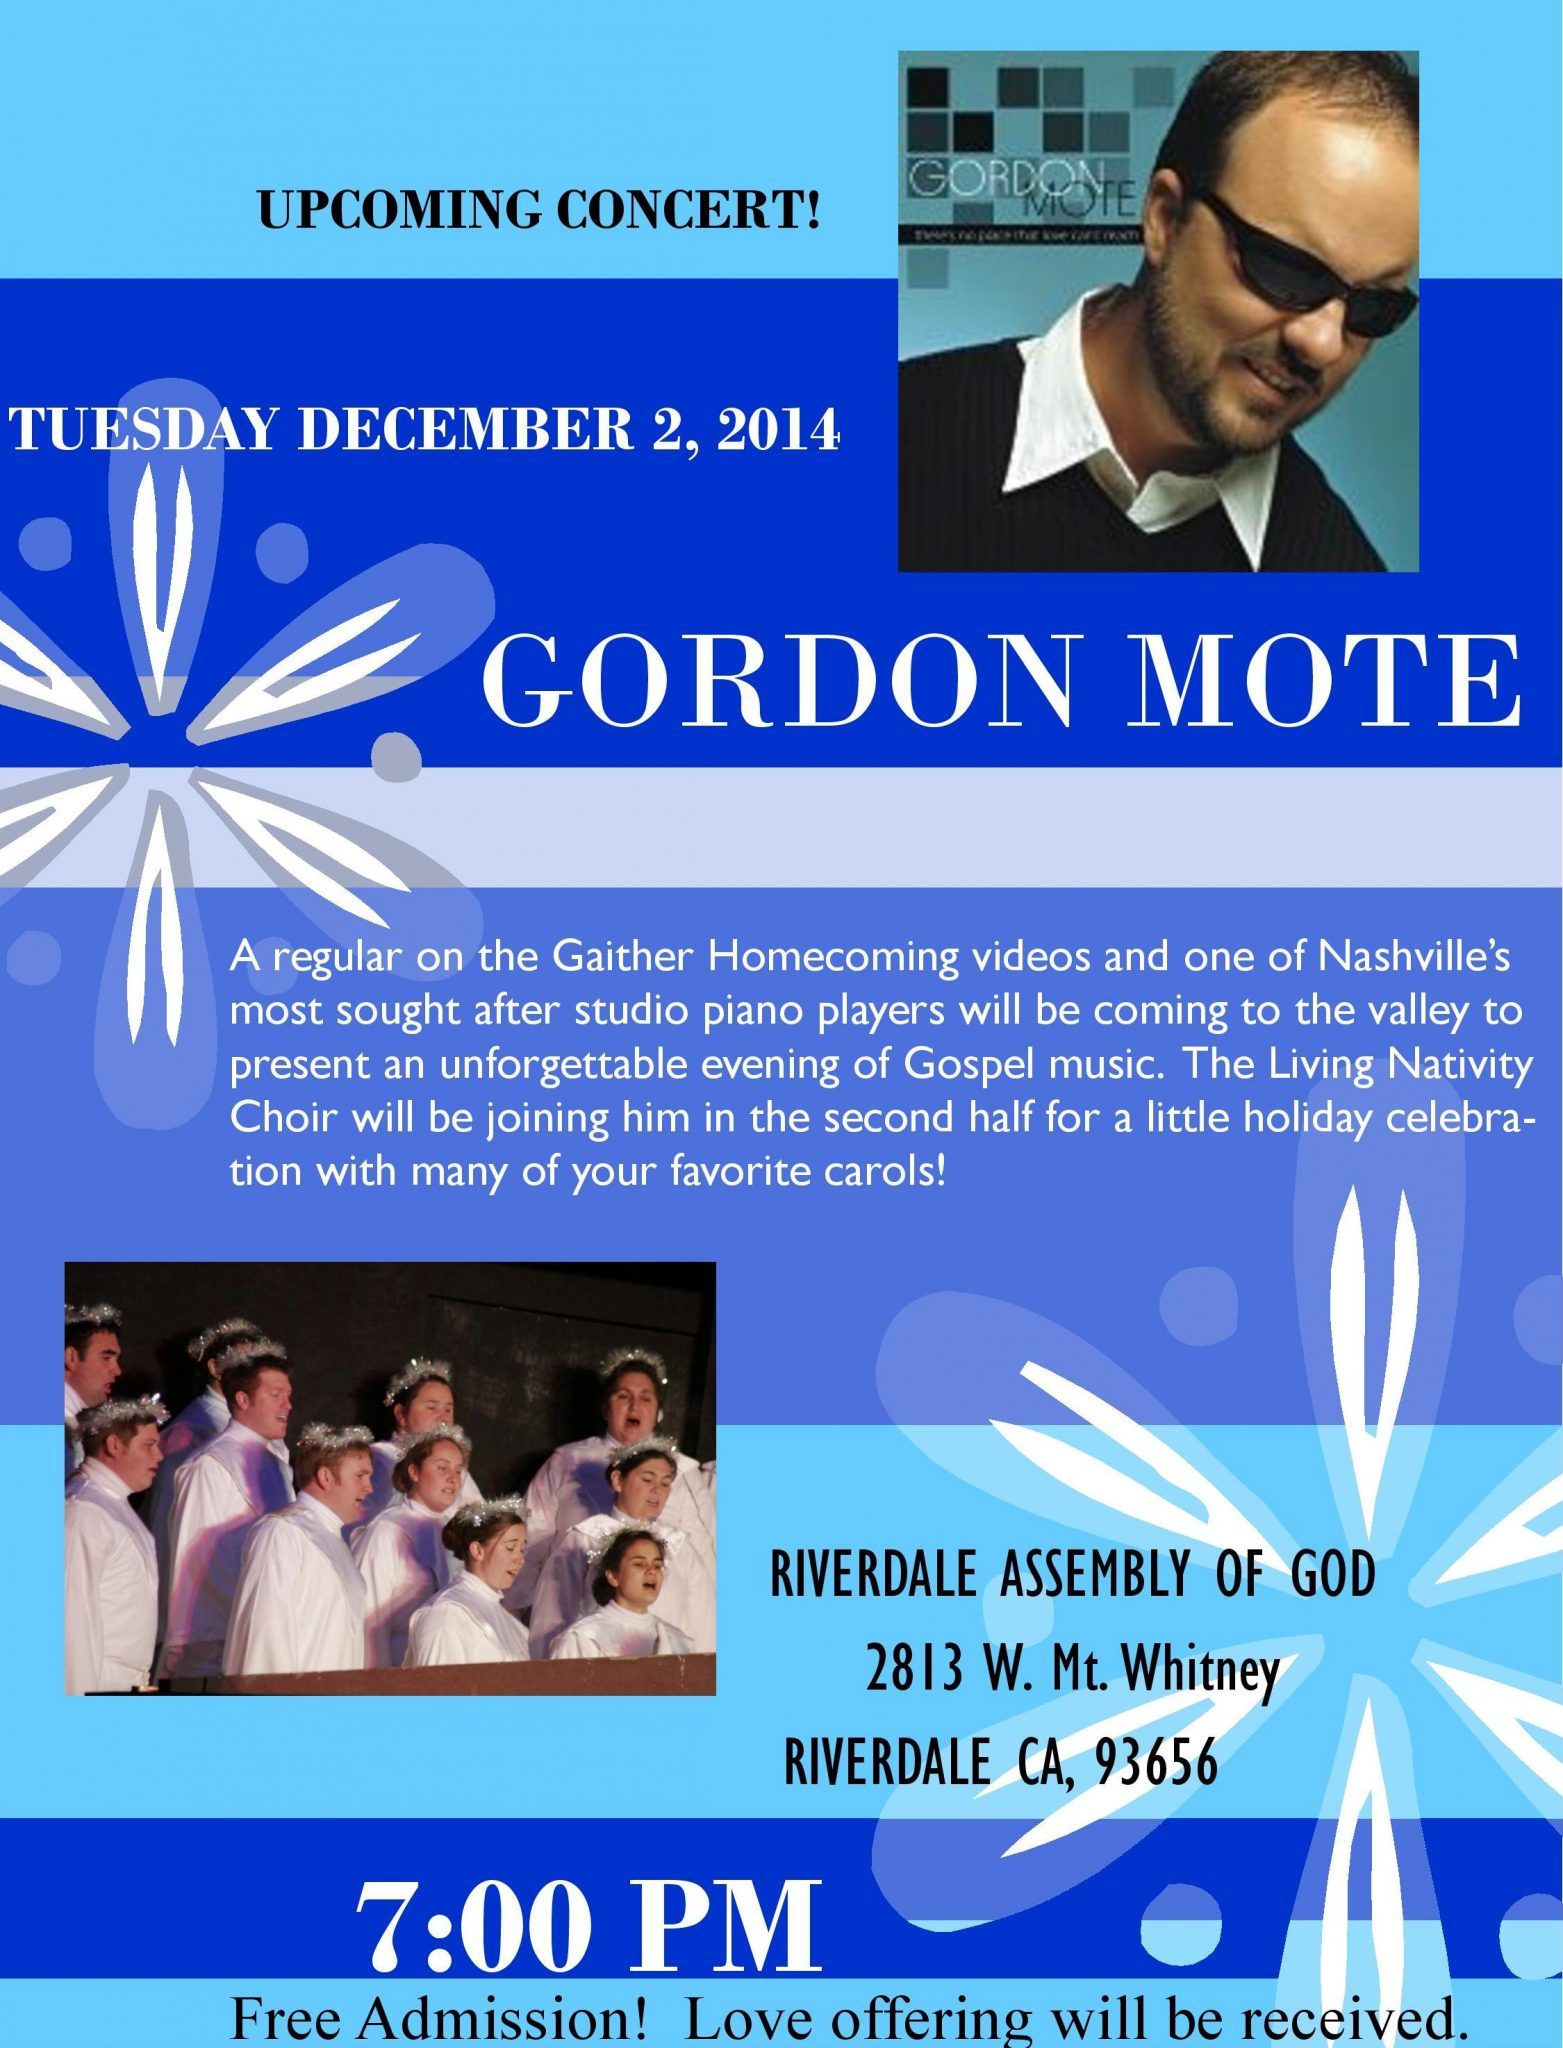 Gordon Mote Concert